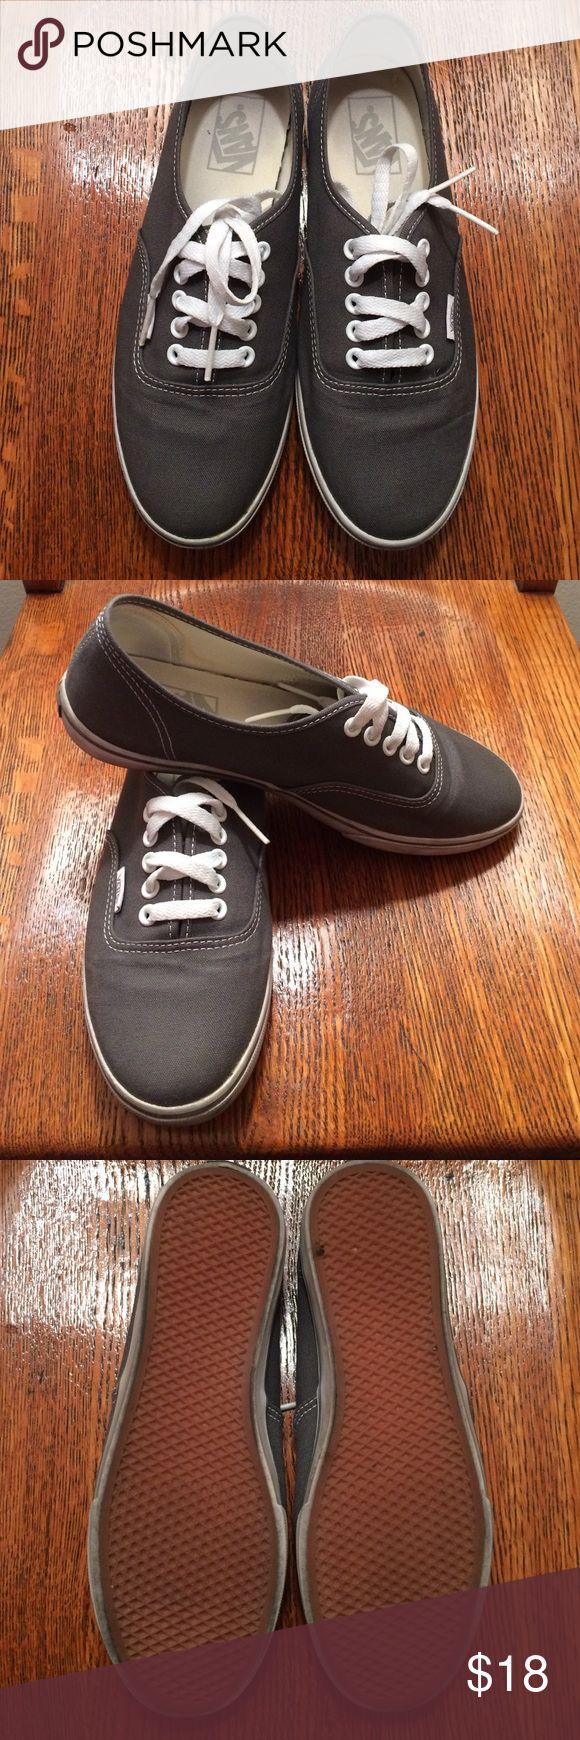 Vans LoPro classic sneakers Womens' gray Vans LoPro sneakers. Have been worn but still in great shape. Vans Shoes Sneakers